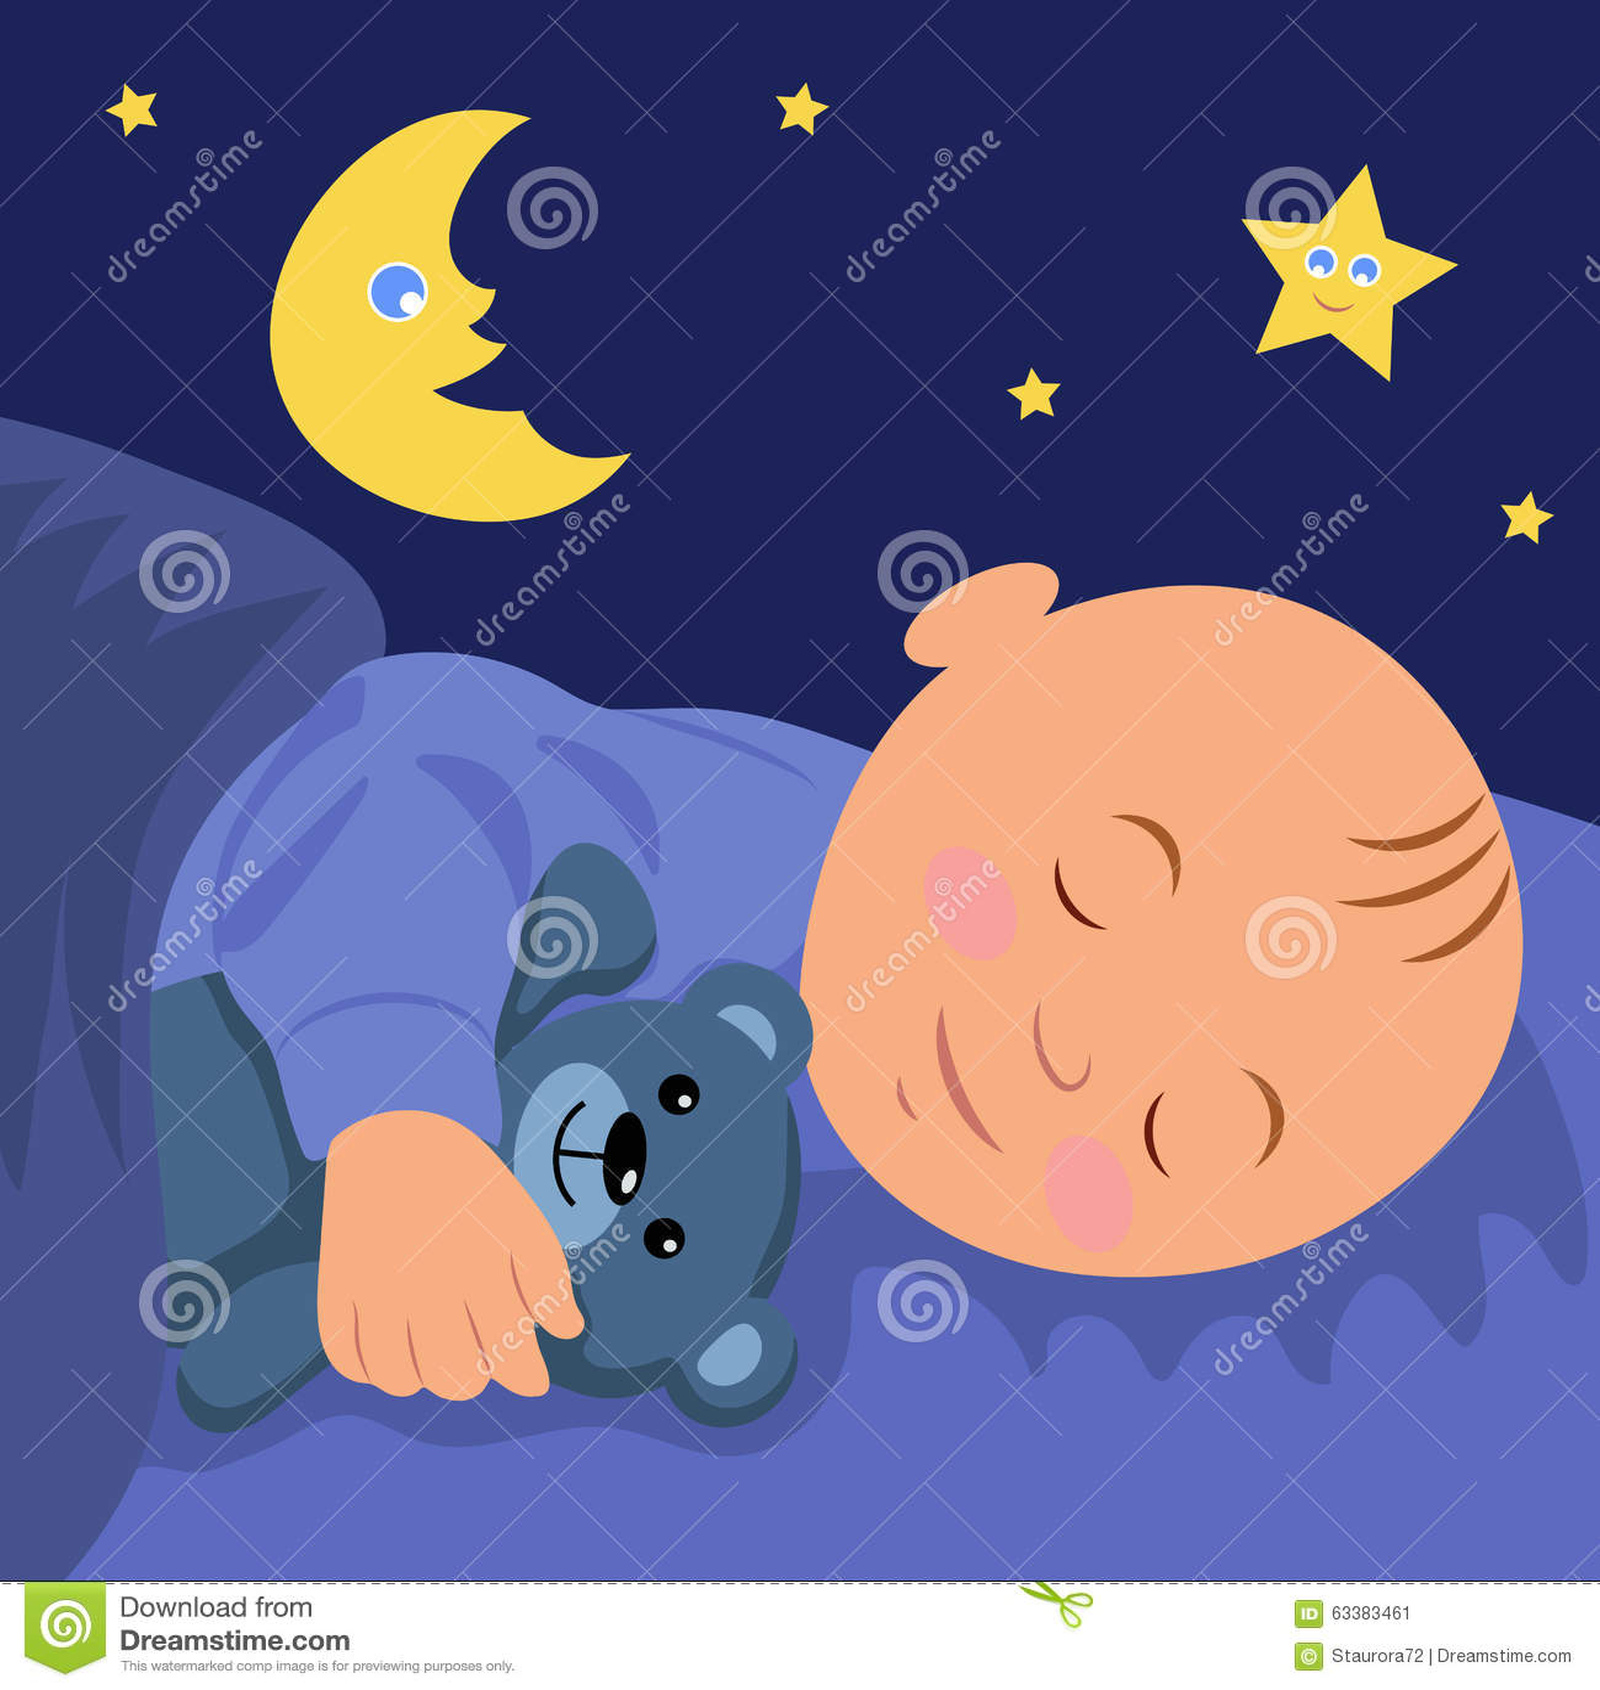 The Baby Is Asleep Hugging Teddy Bear Vector Illustration